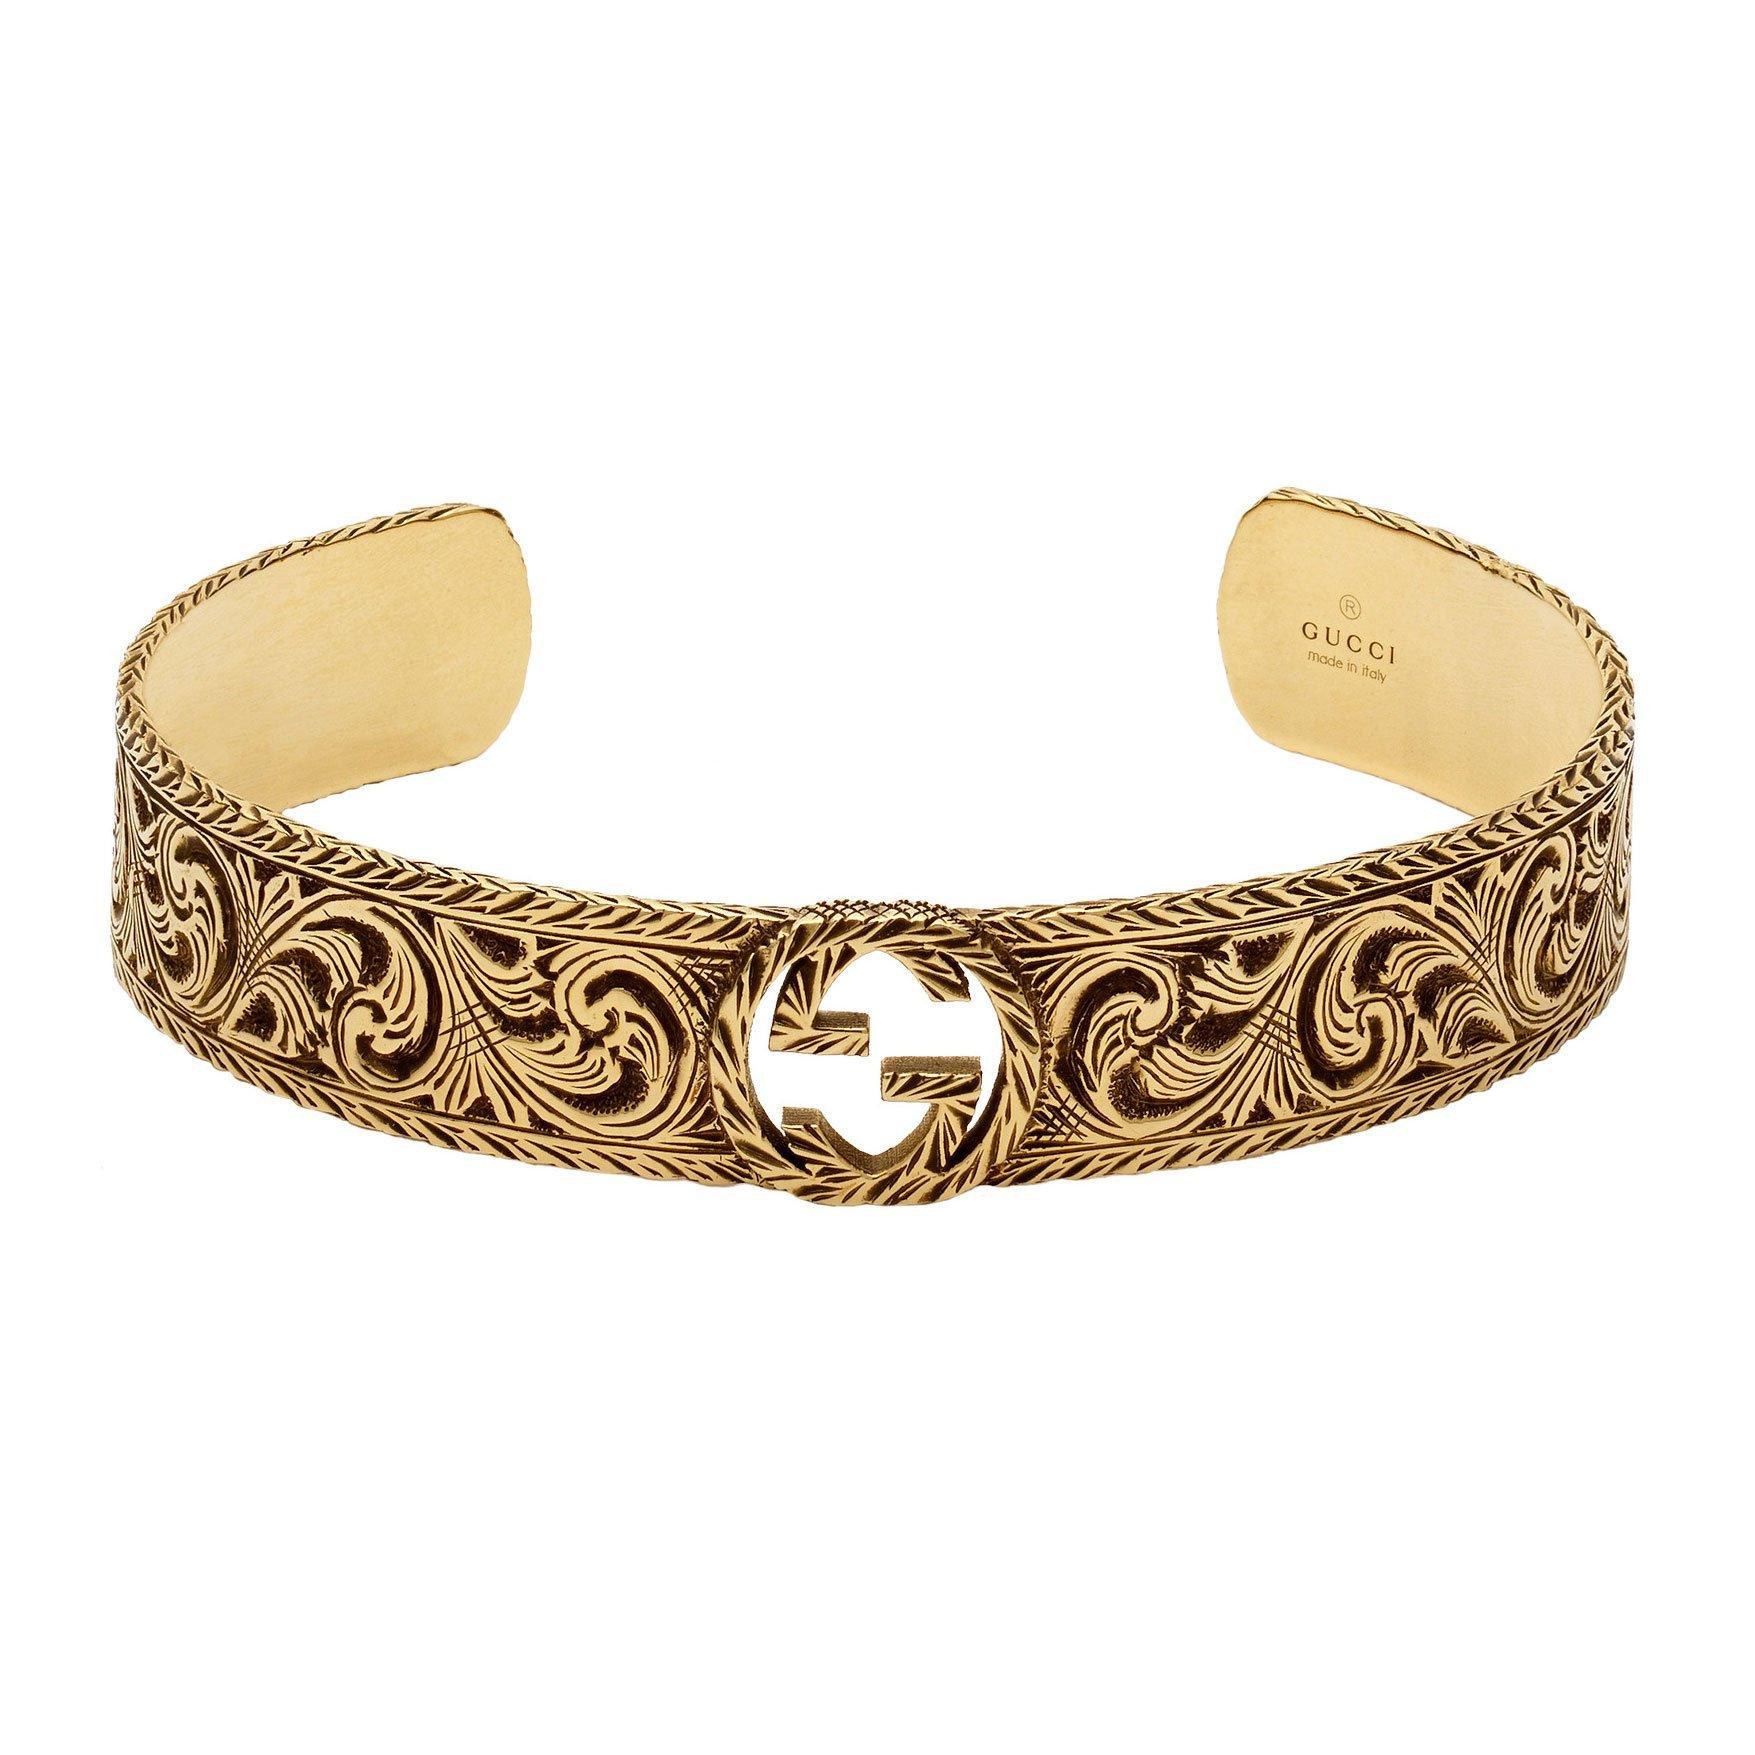 Gucci Interlocking G 18ct Gold Wide Cuff Bracelet